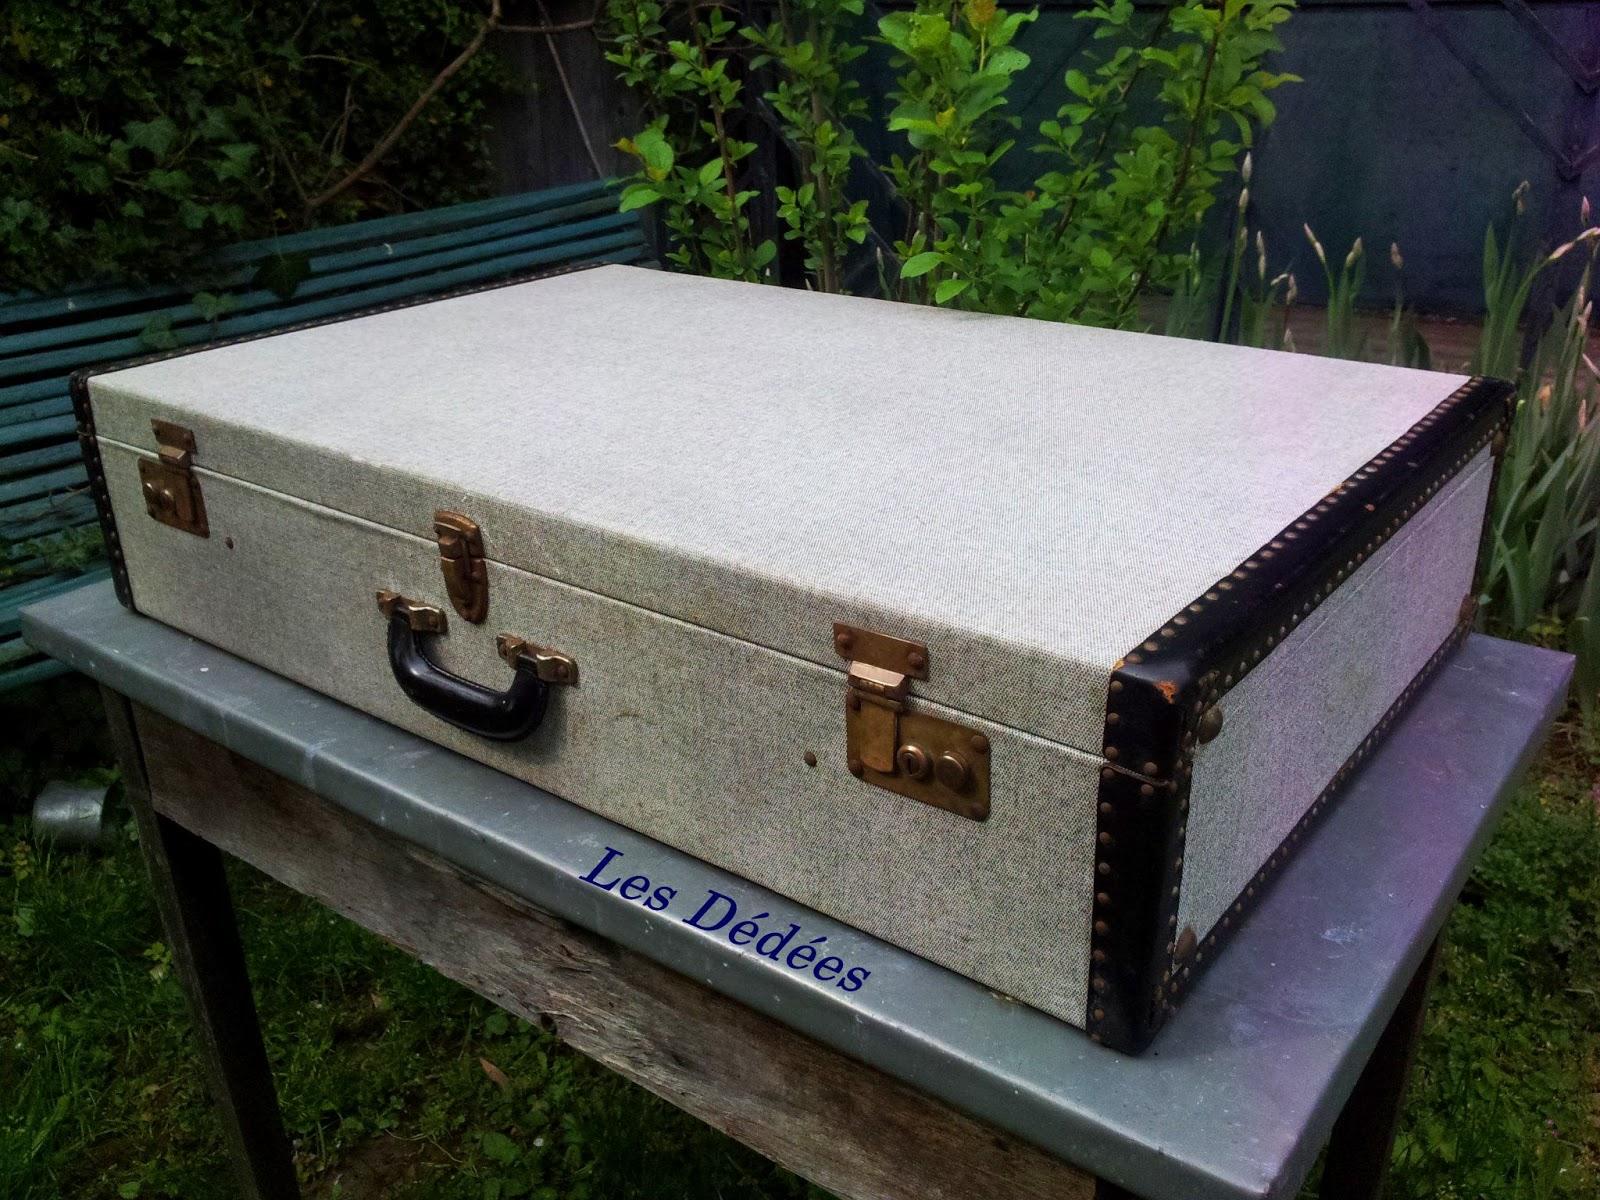 Malle Comme Table Basse les dedees : vintage, recup, creations: belle valise- malle